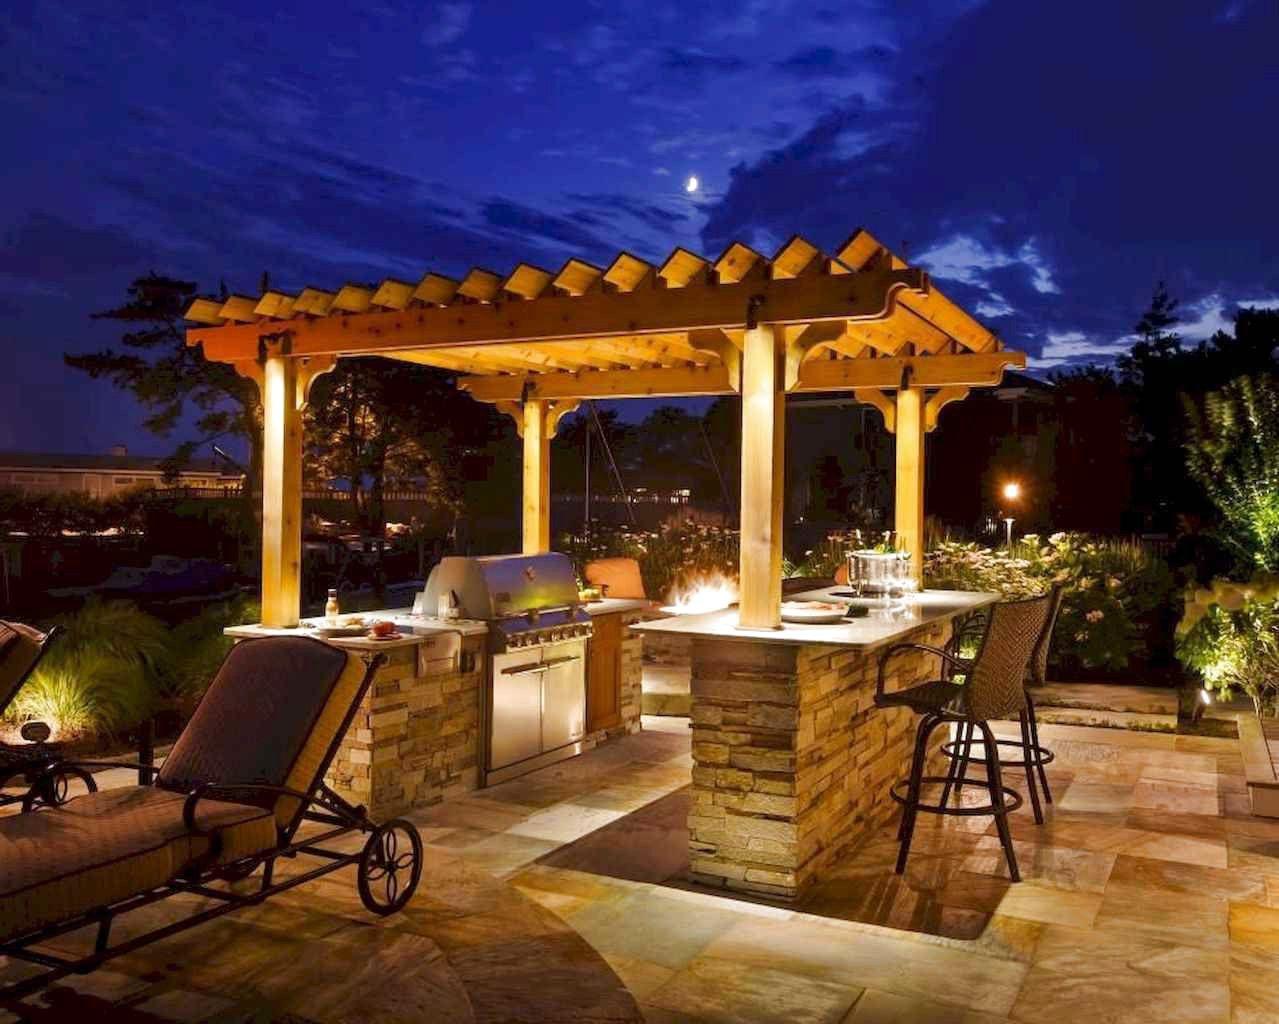 63 Stunning Backyard Privacy Fence Decoration Ideas On A